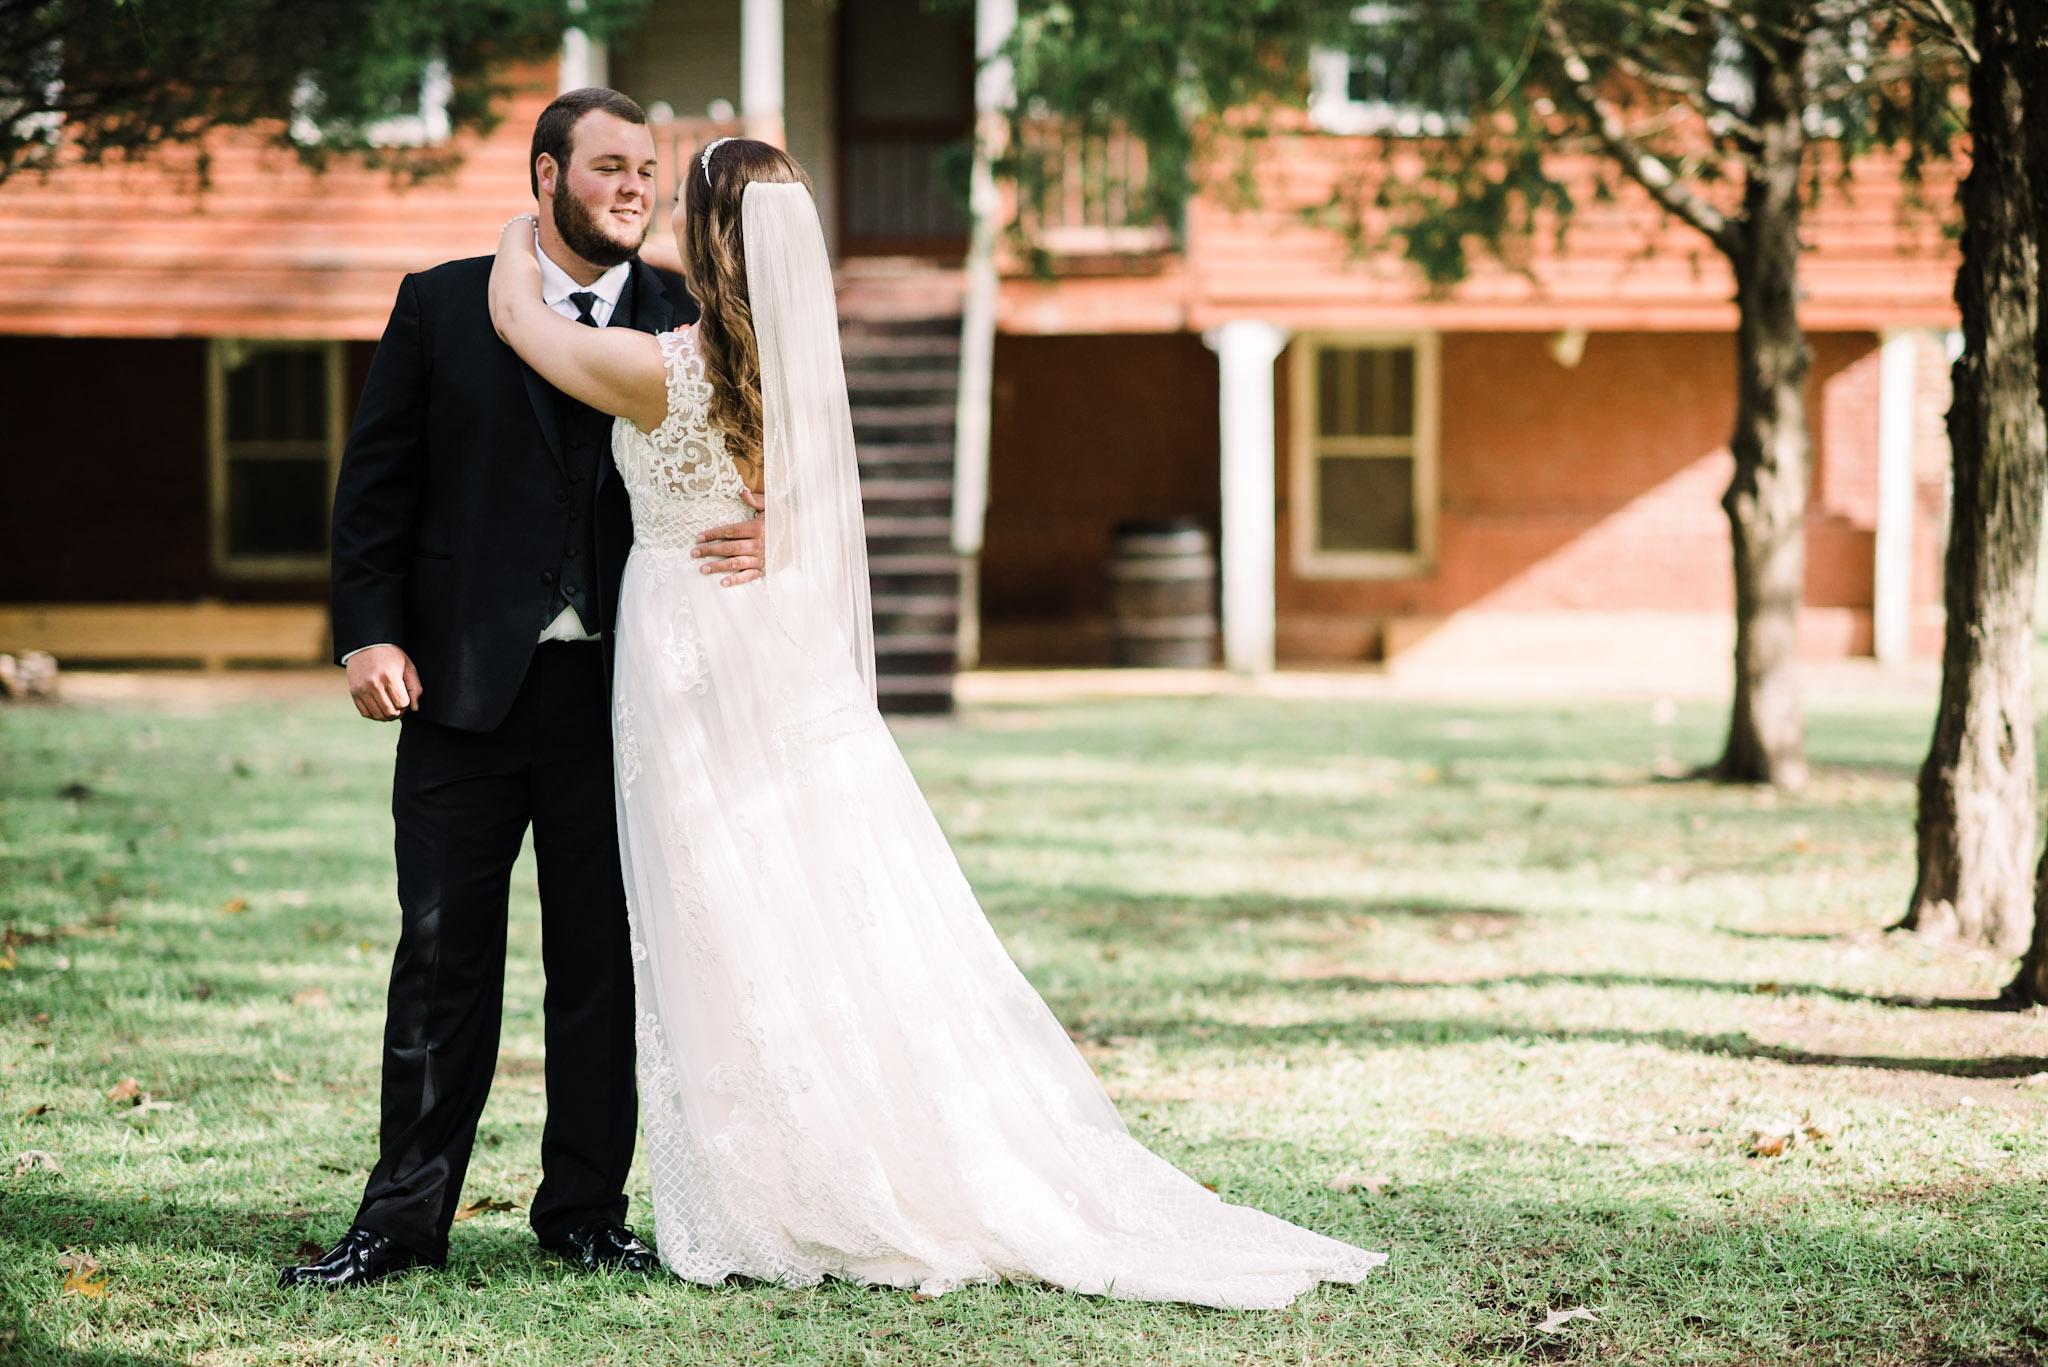 Jas_Natalie_Foxworth_Wedding_2018-1.jpg